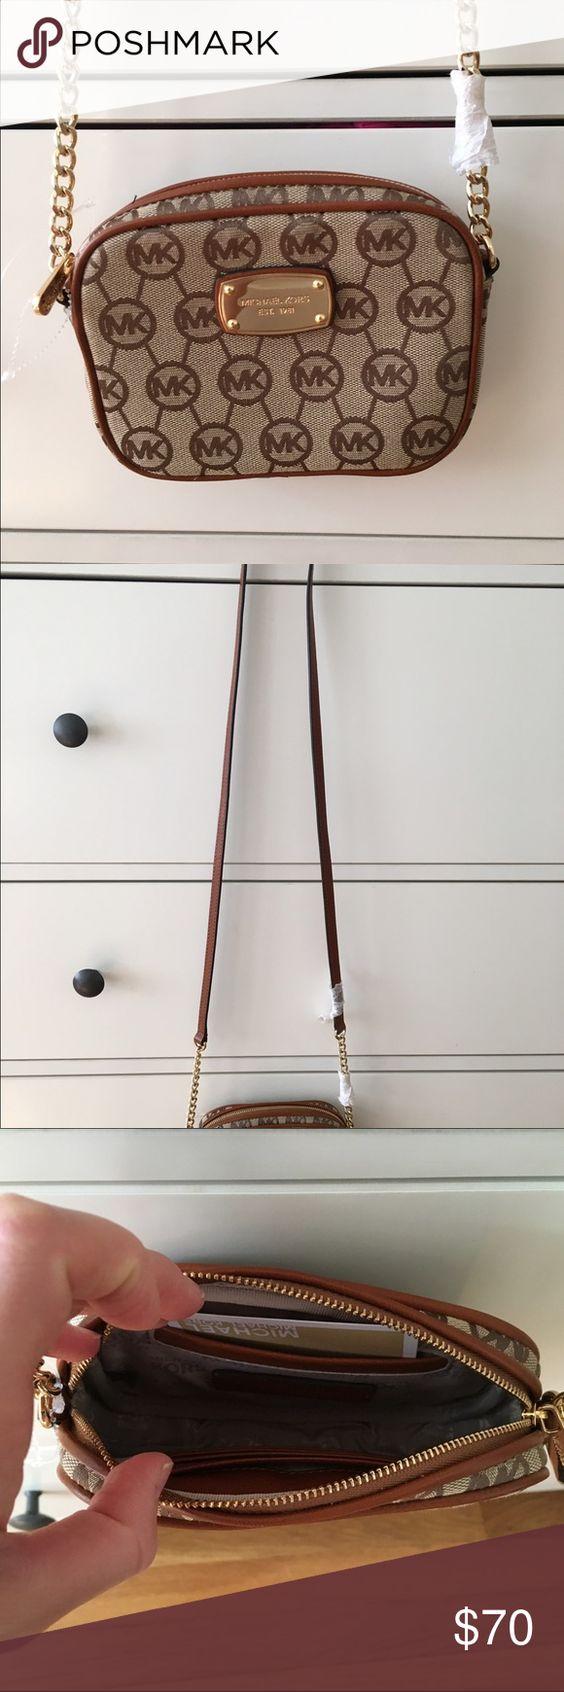 Michael Michael Kors Jet Set Crossbody Brand new with tags MICHAEL Michael Kors Bags Crossbody Bags